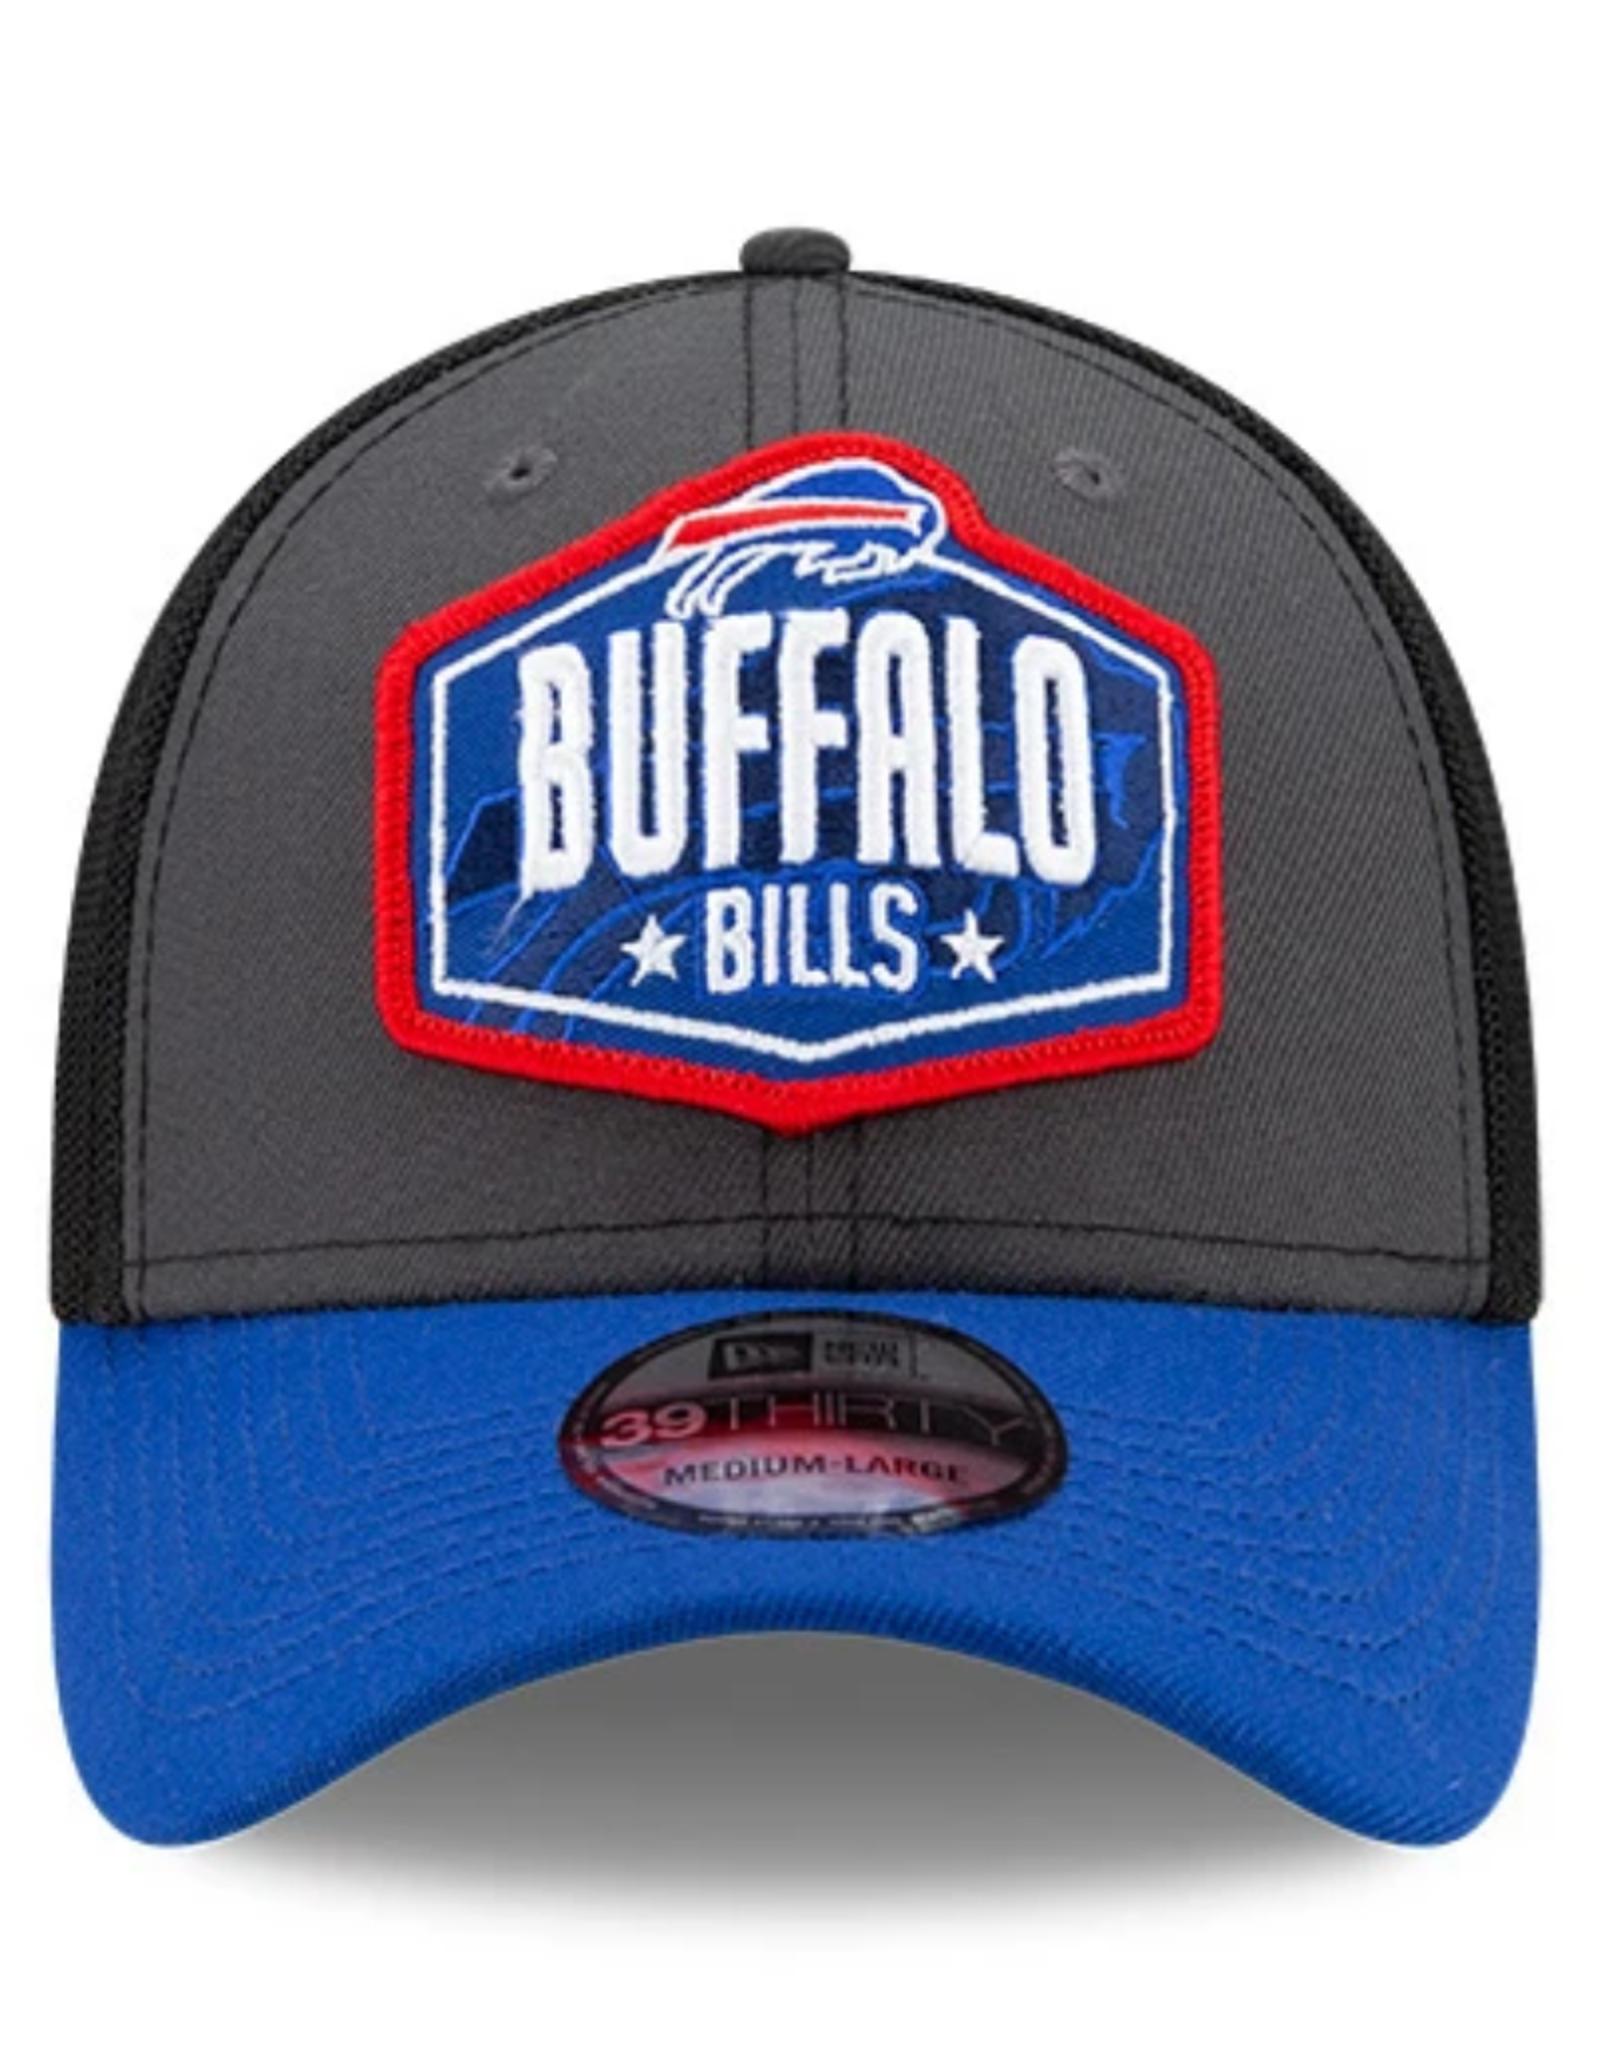 New Era Men's '21 39THIRTY NFL Draft Hat Buffalo Bills